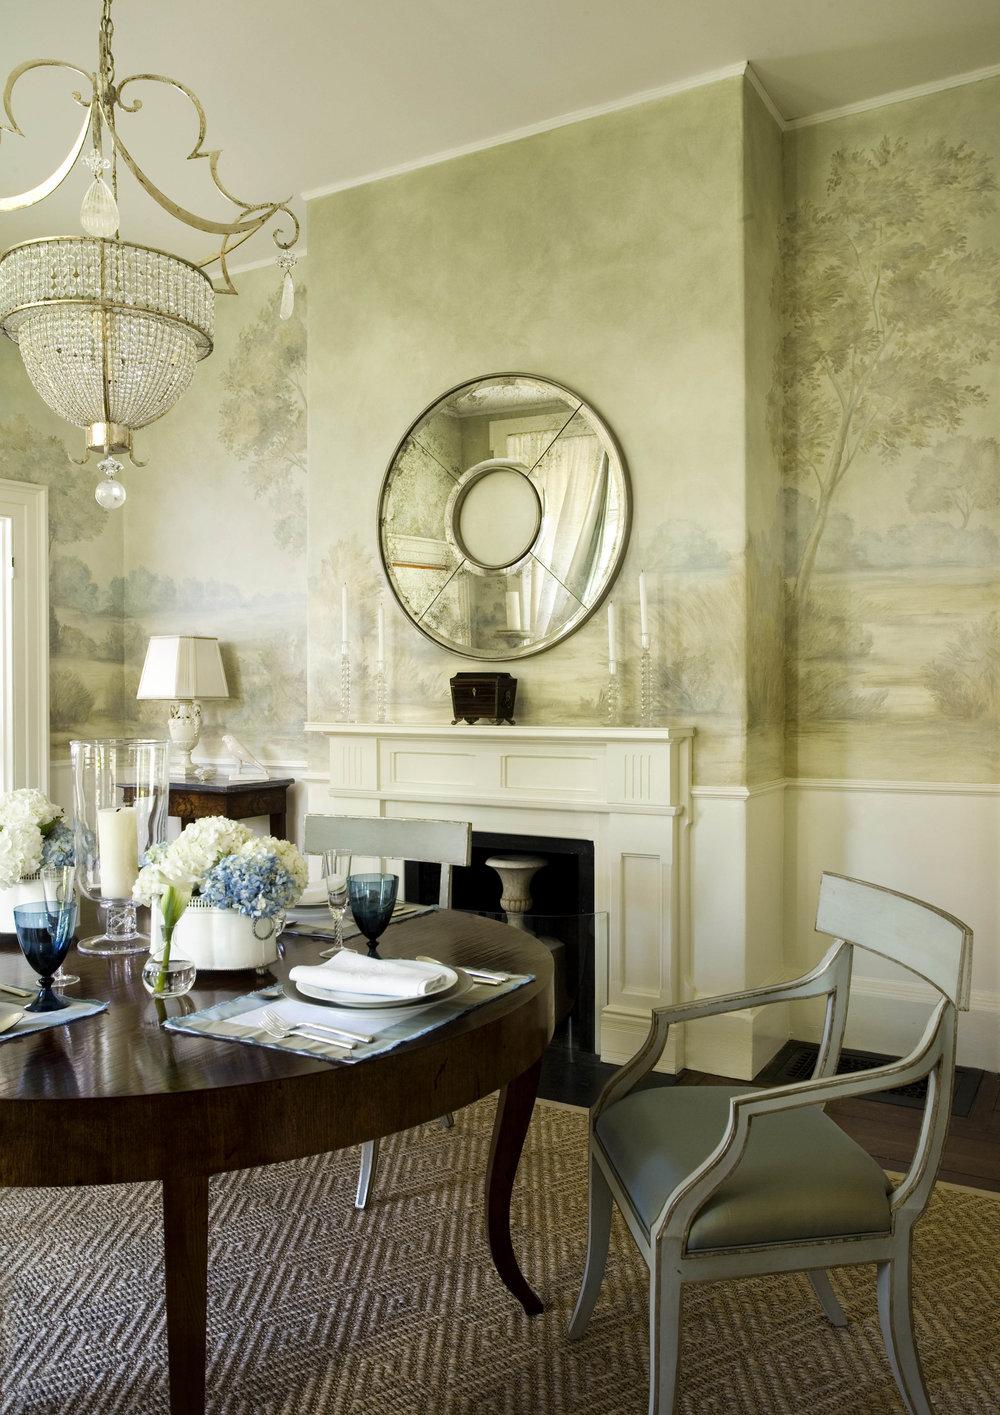 Barringtons Mist mural in dining room fireplace.jpg